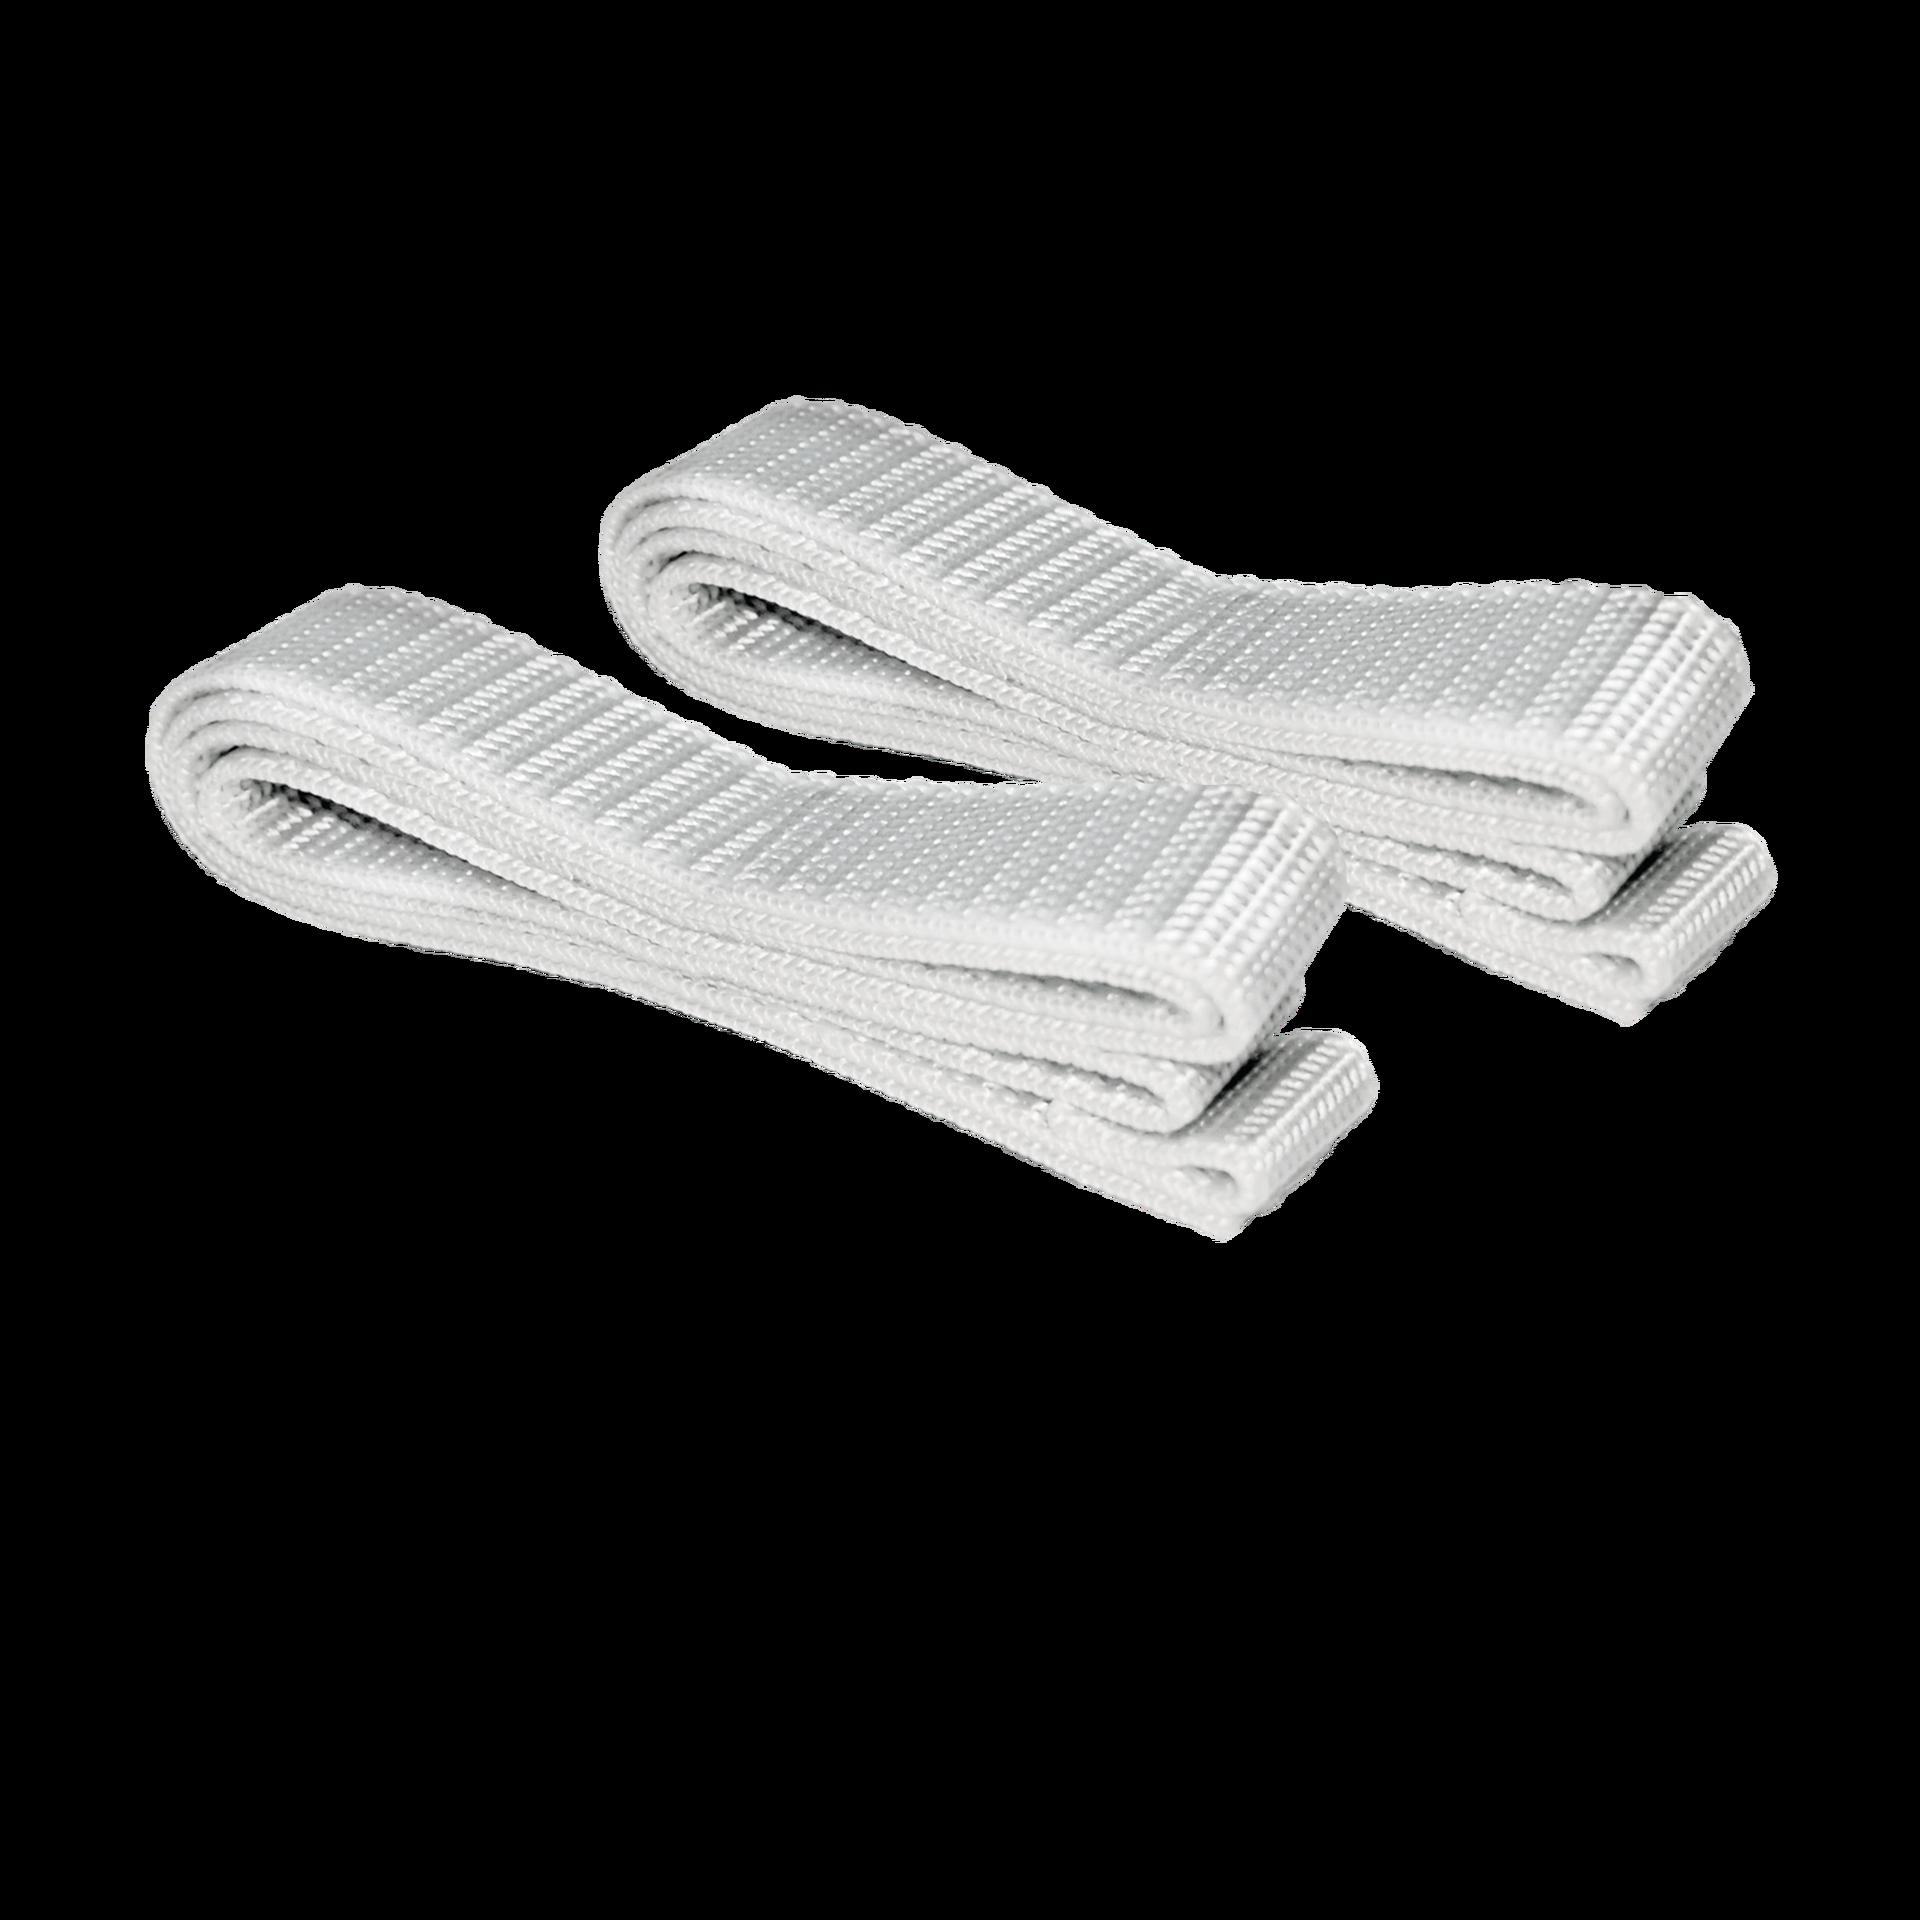 80 cm Belt Straps white for BALCONERA (2 pieces)